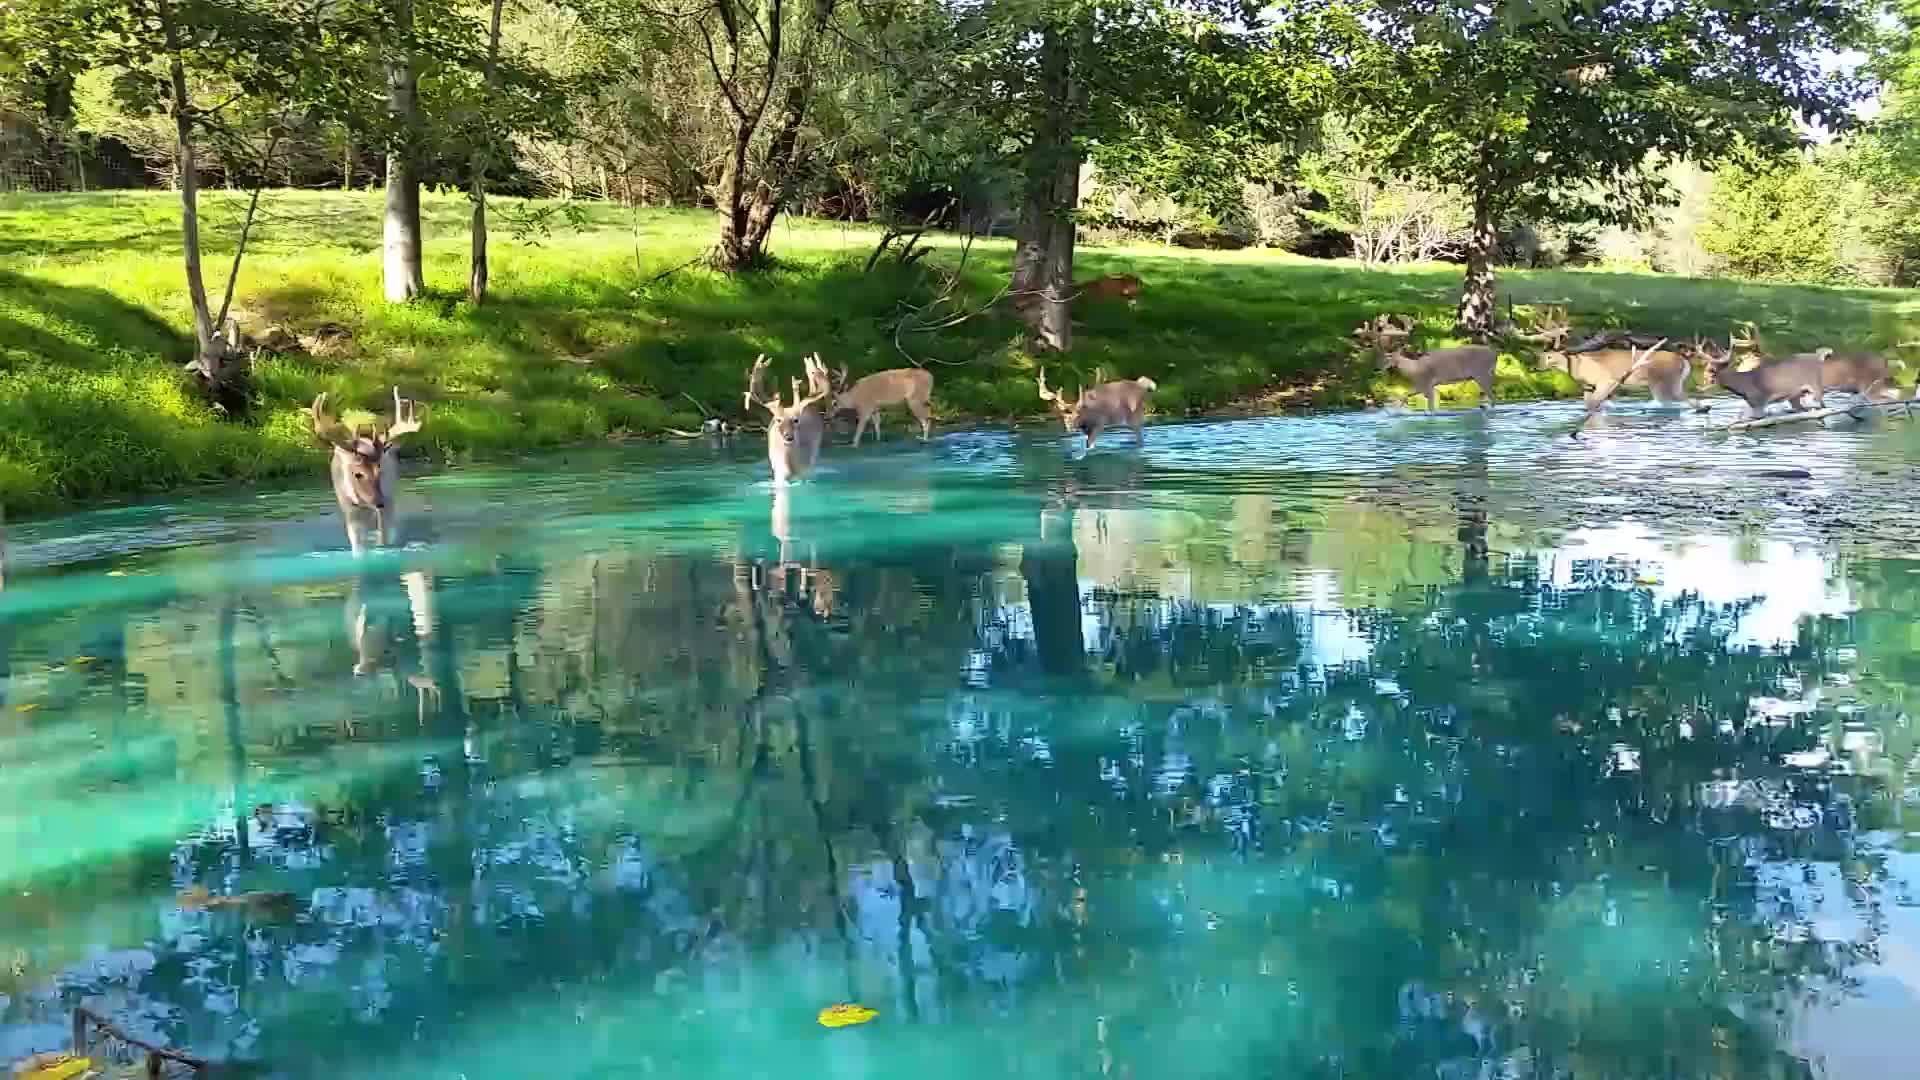 Monster bucks in blue water GIFs